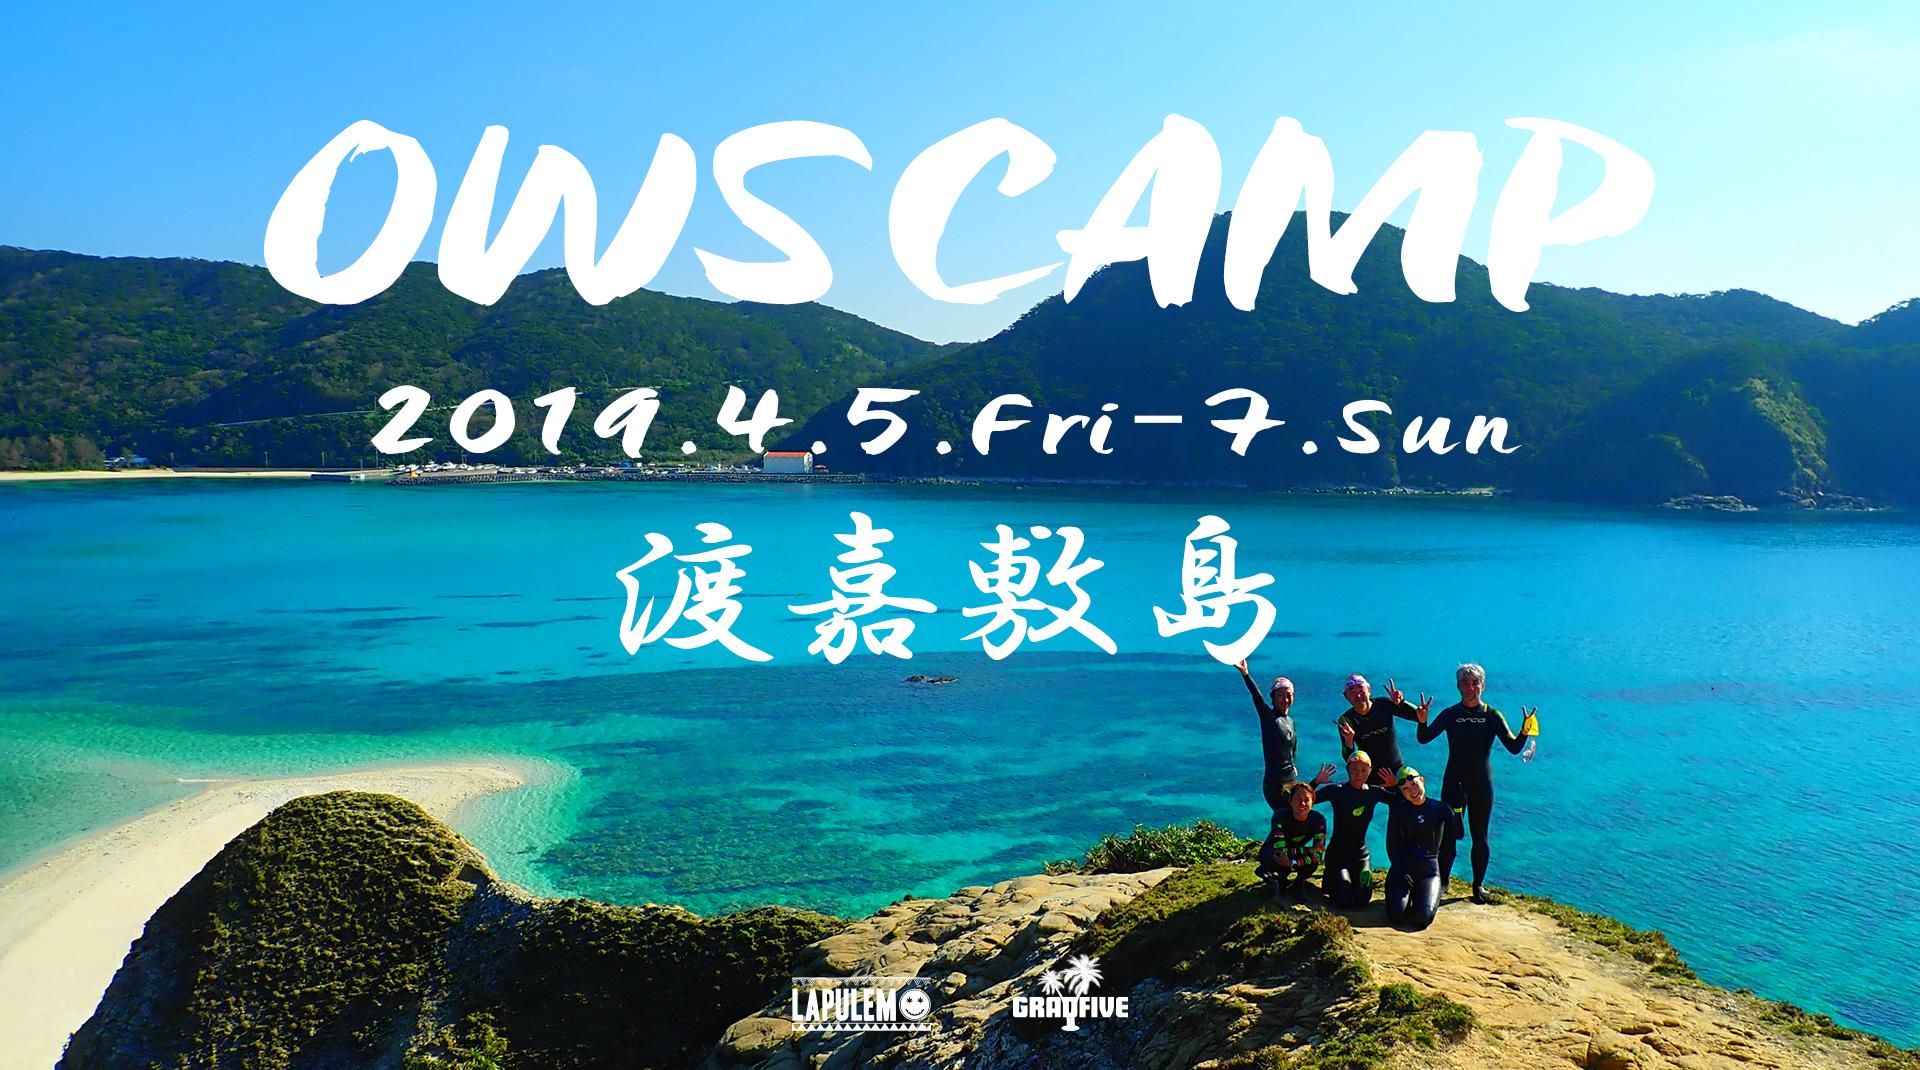 Lapulem OWS CAMP in 渡嘉敷島 2019.4.5(金) - 7(日)